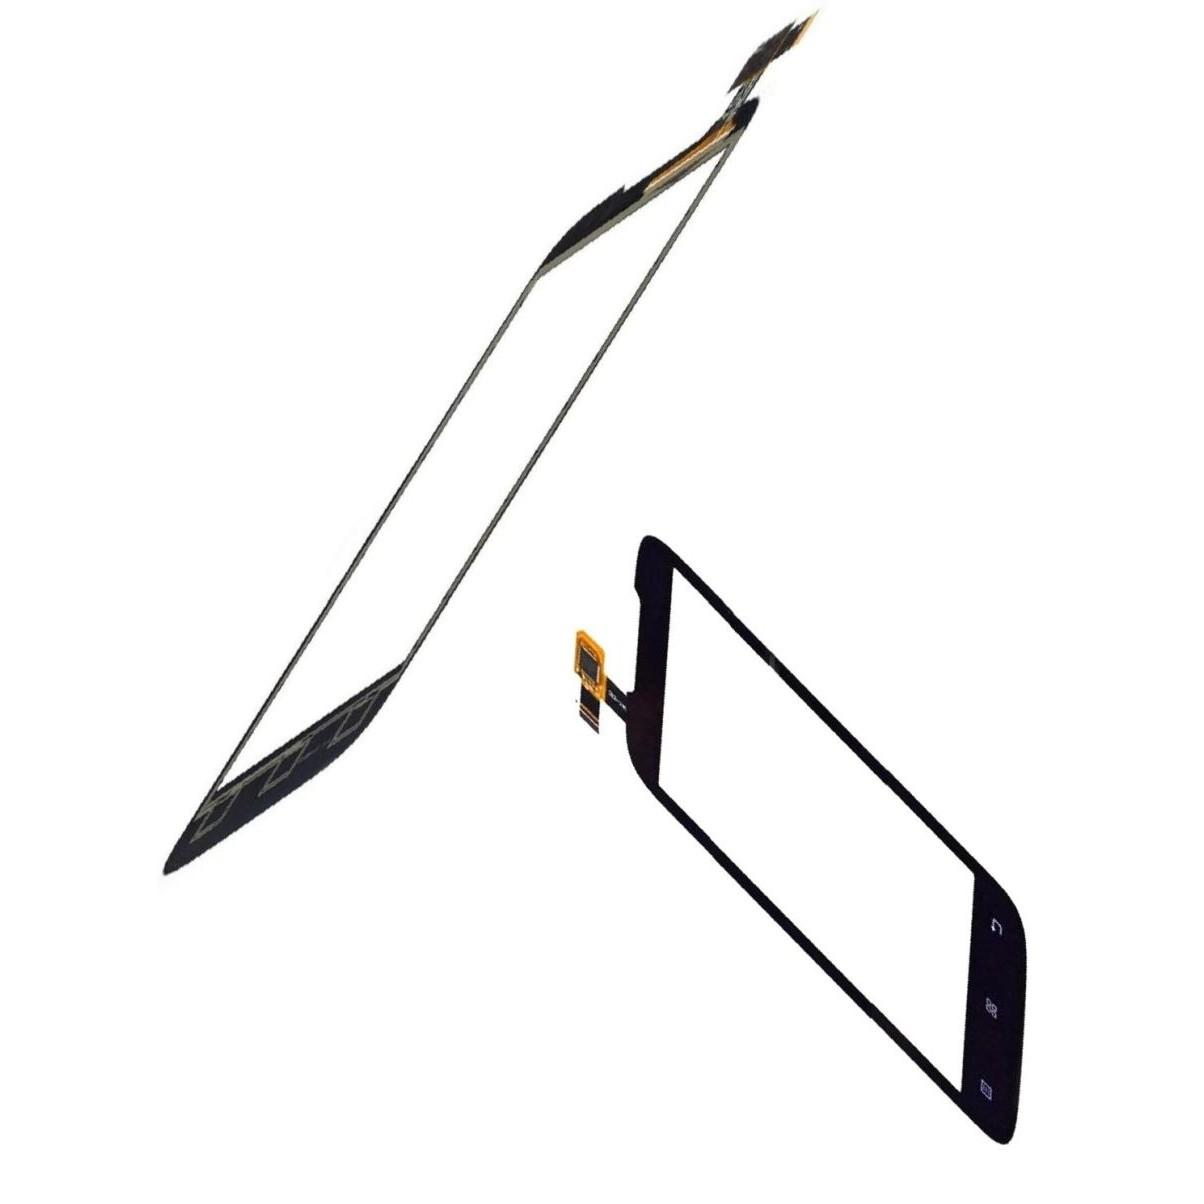 Touch Screen Digitizer For Lenovo A369i